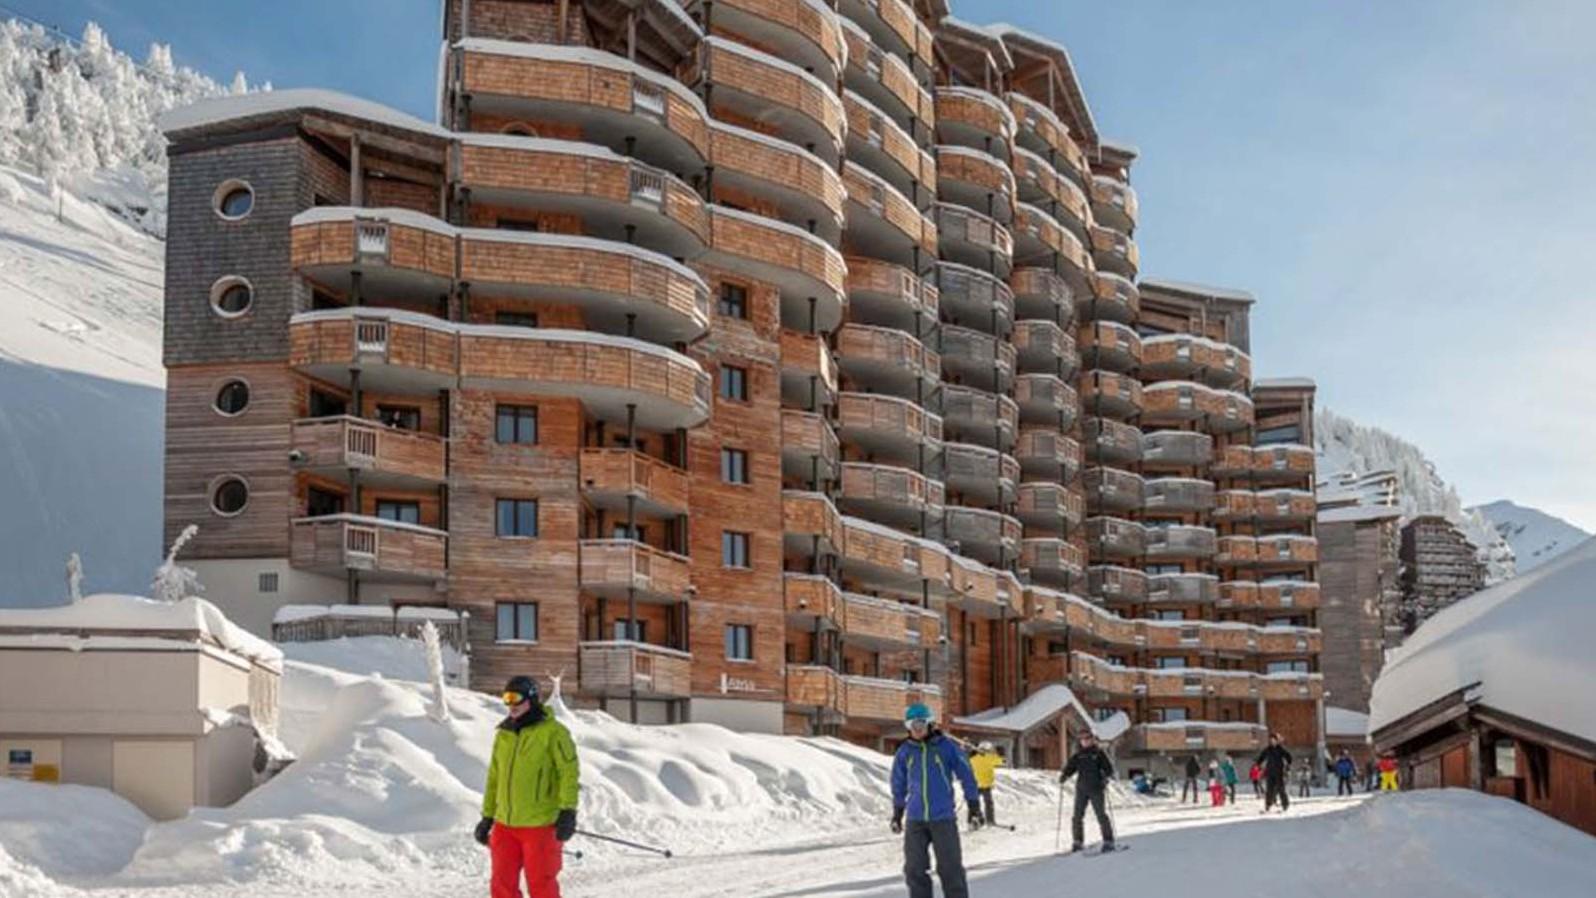 Avoriaz ski resort, France